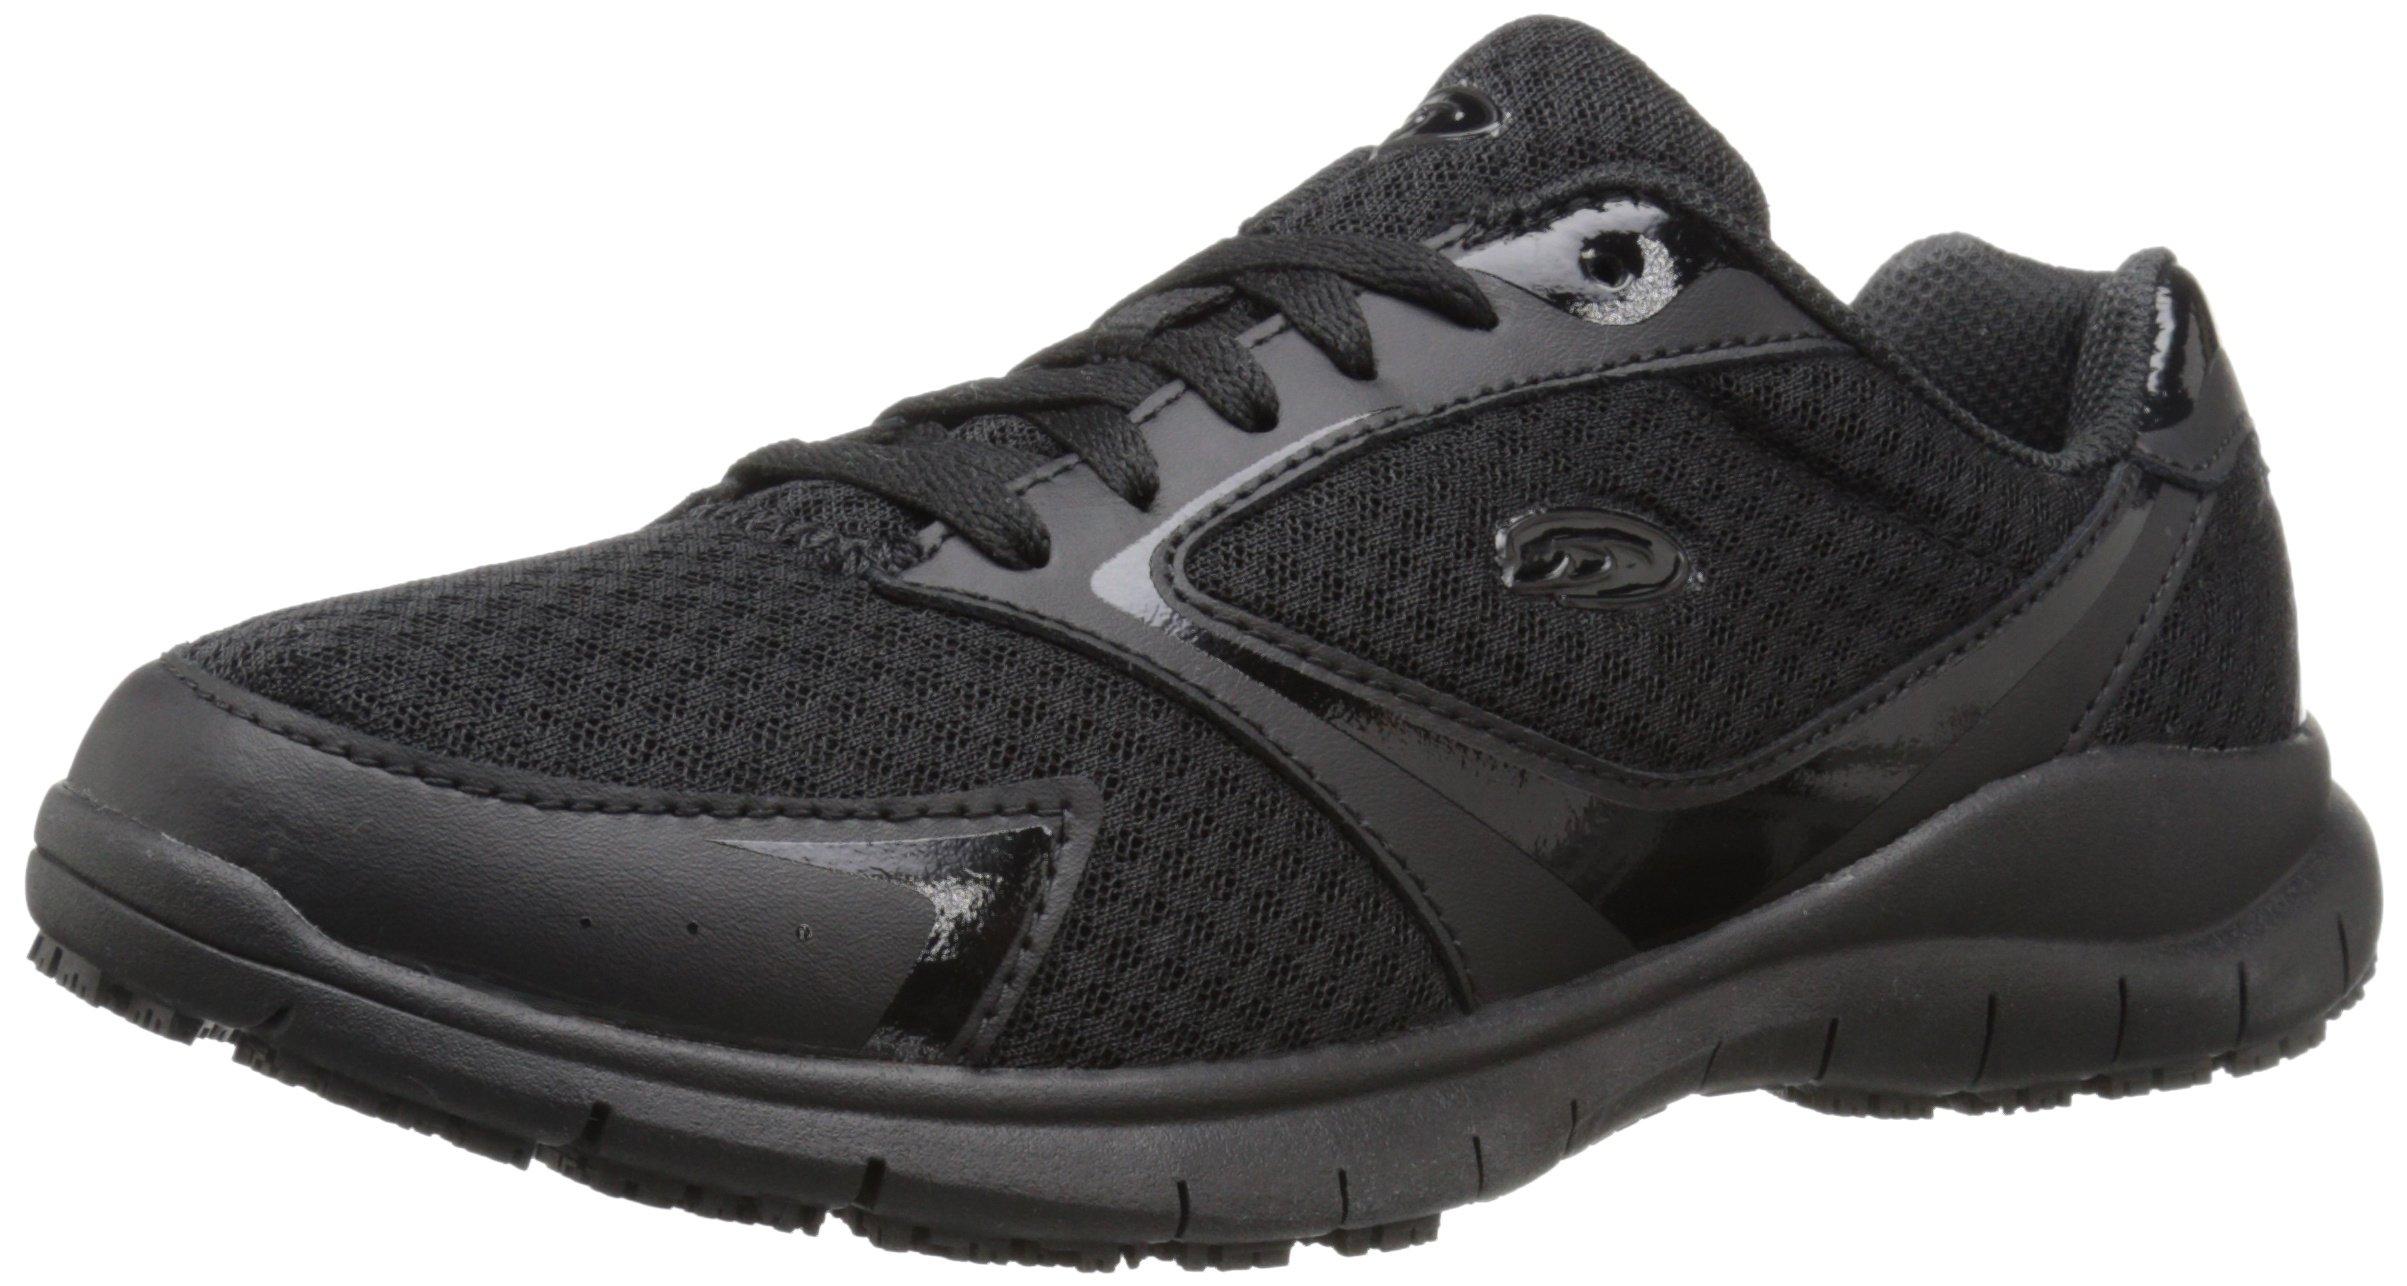 Dr. Scholl's Women's Inhale Slip Resistant Sneaker, Black, 6.5 M US